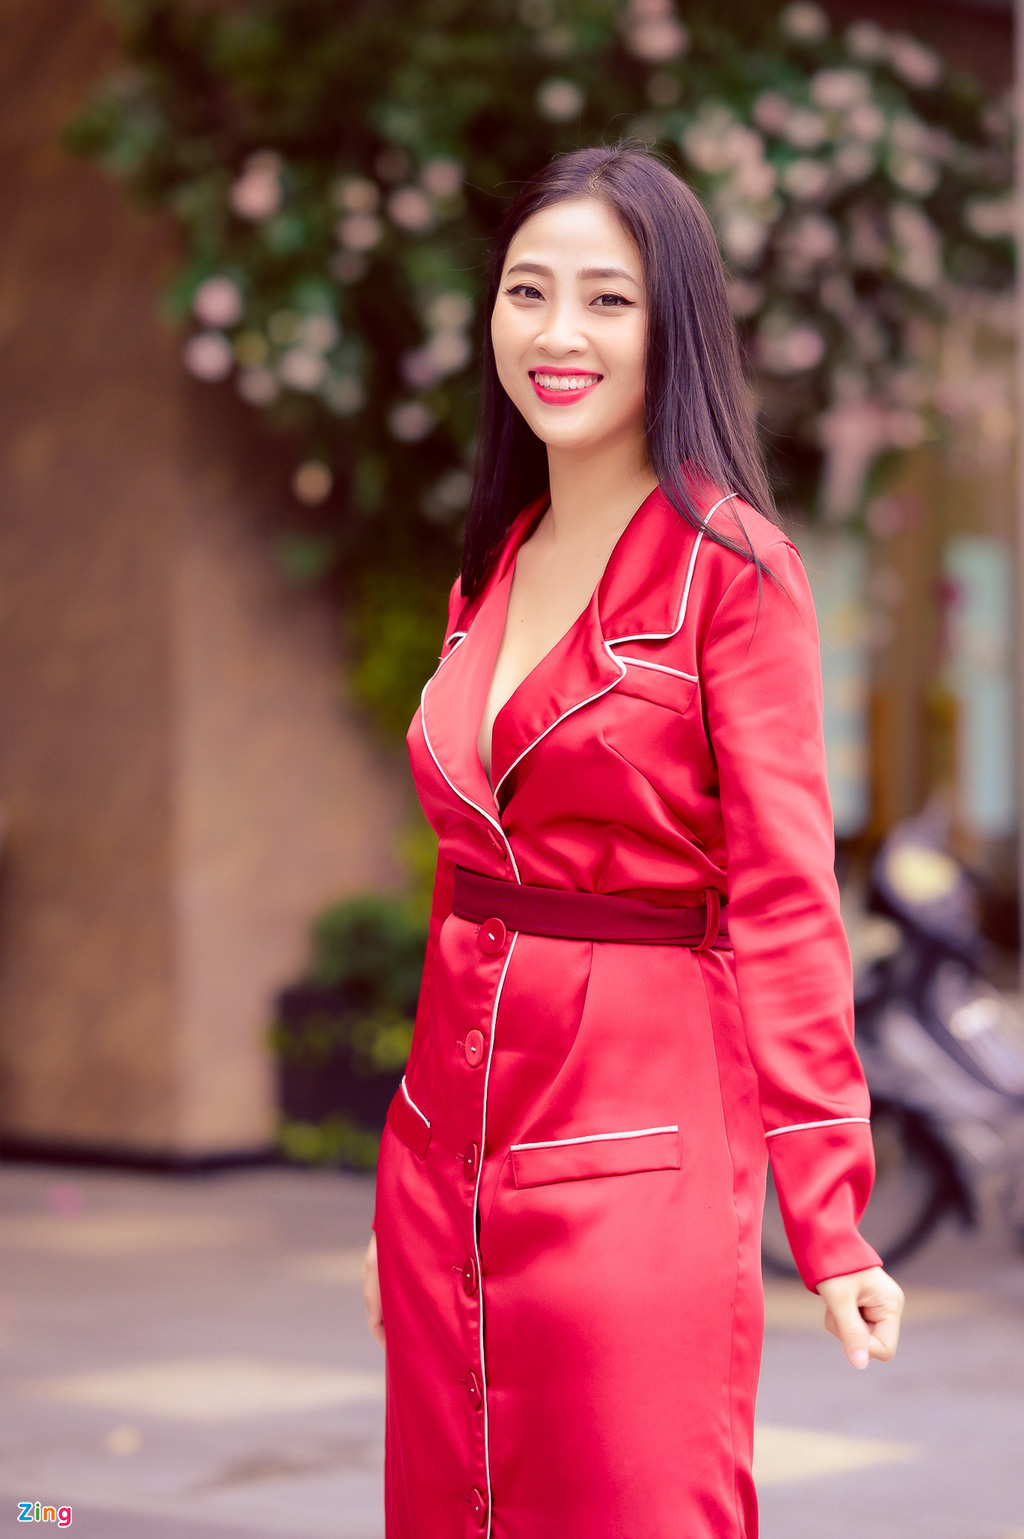 MC Lieu Ha Trinh: 'Toi va ban trai Tay quen nhau qua app hen ho' hinh anh 4 NGUYEN_BA_NGOC_ZING_8920.jpg